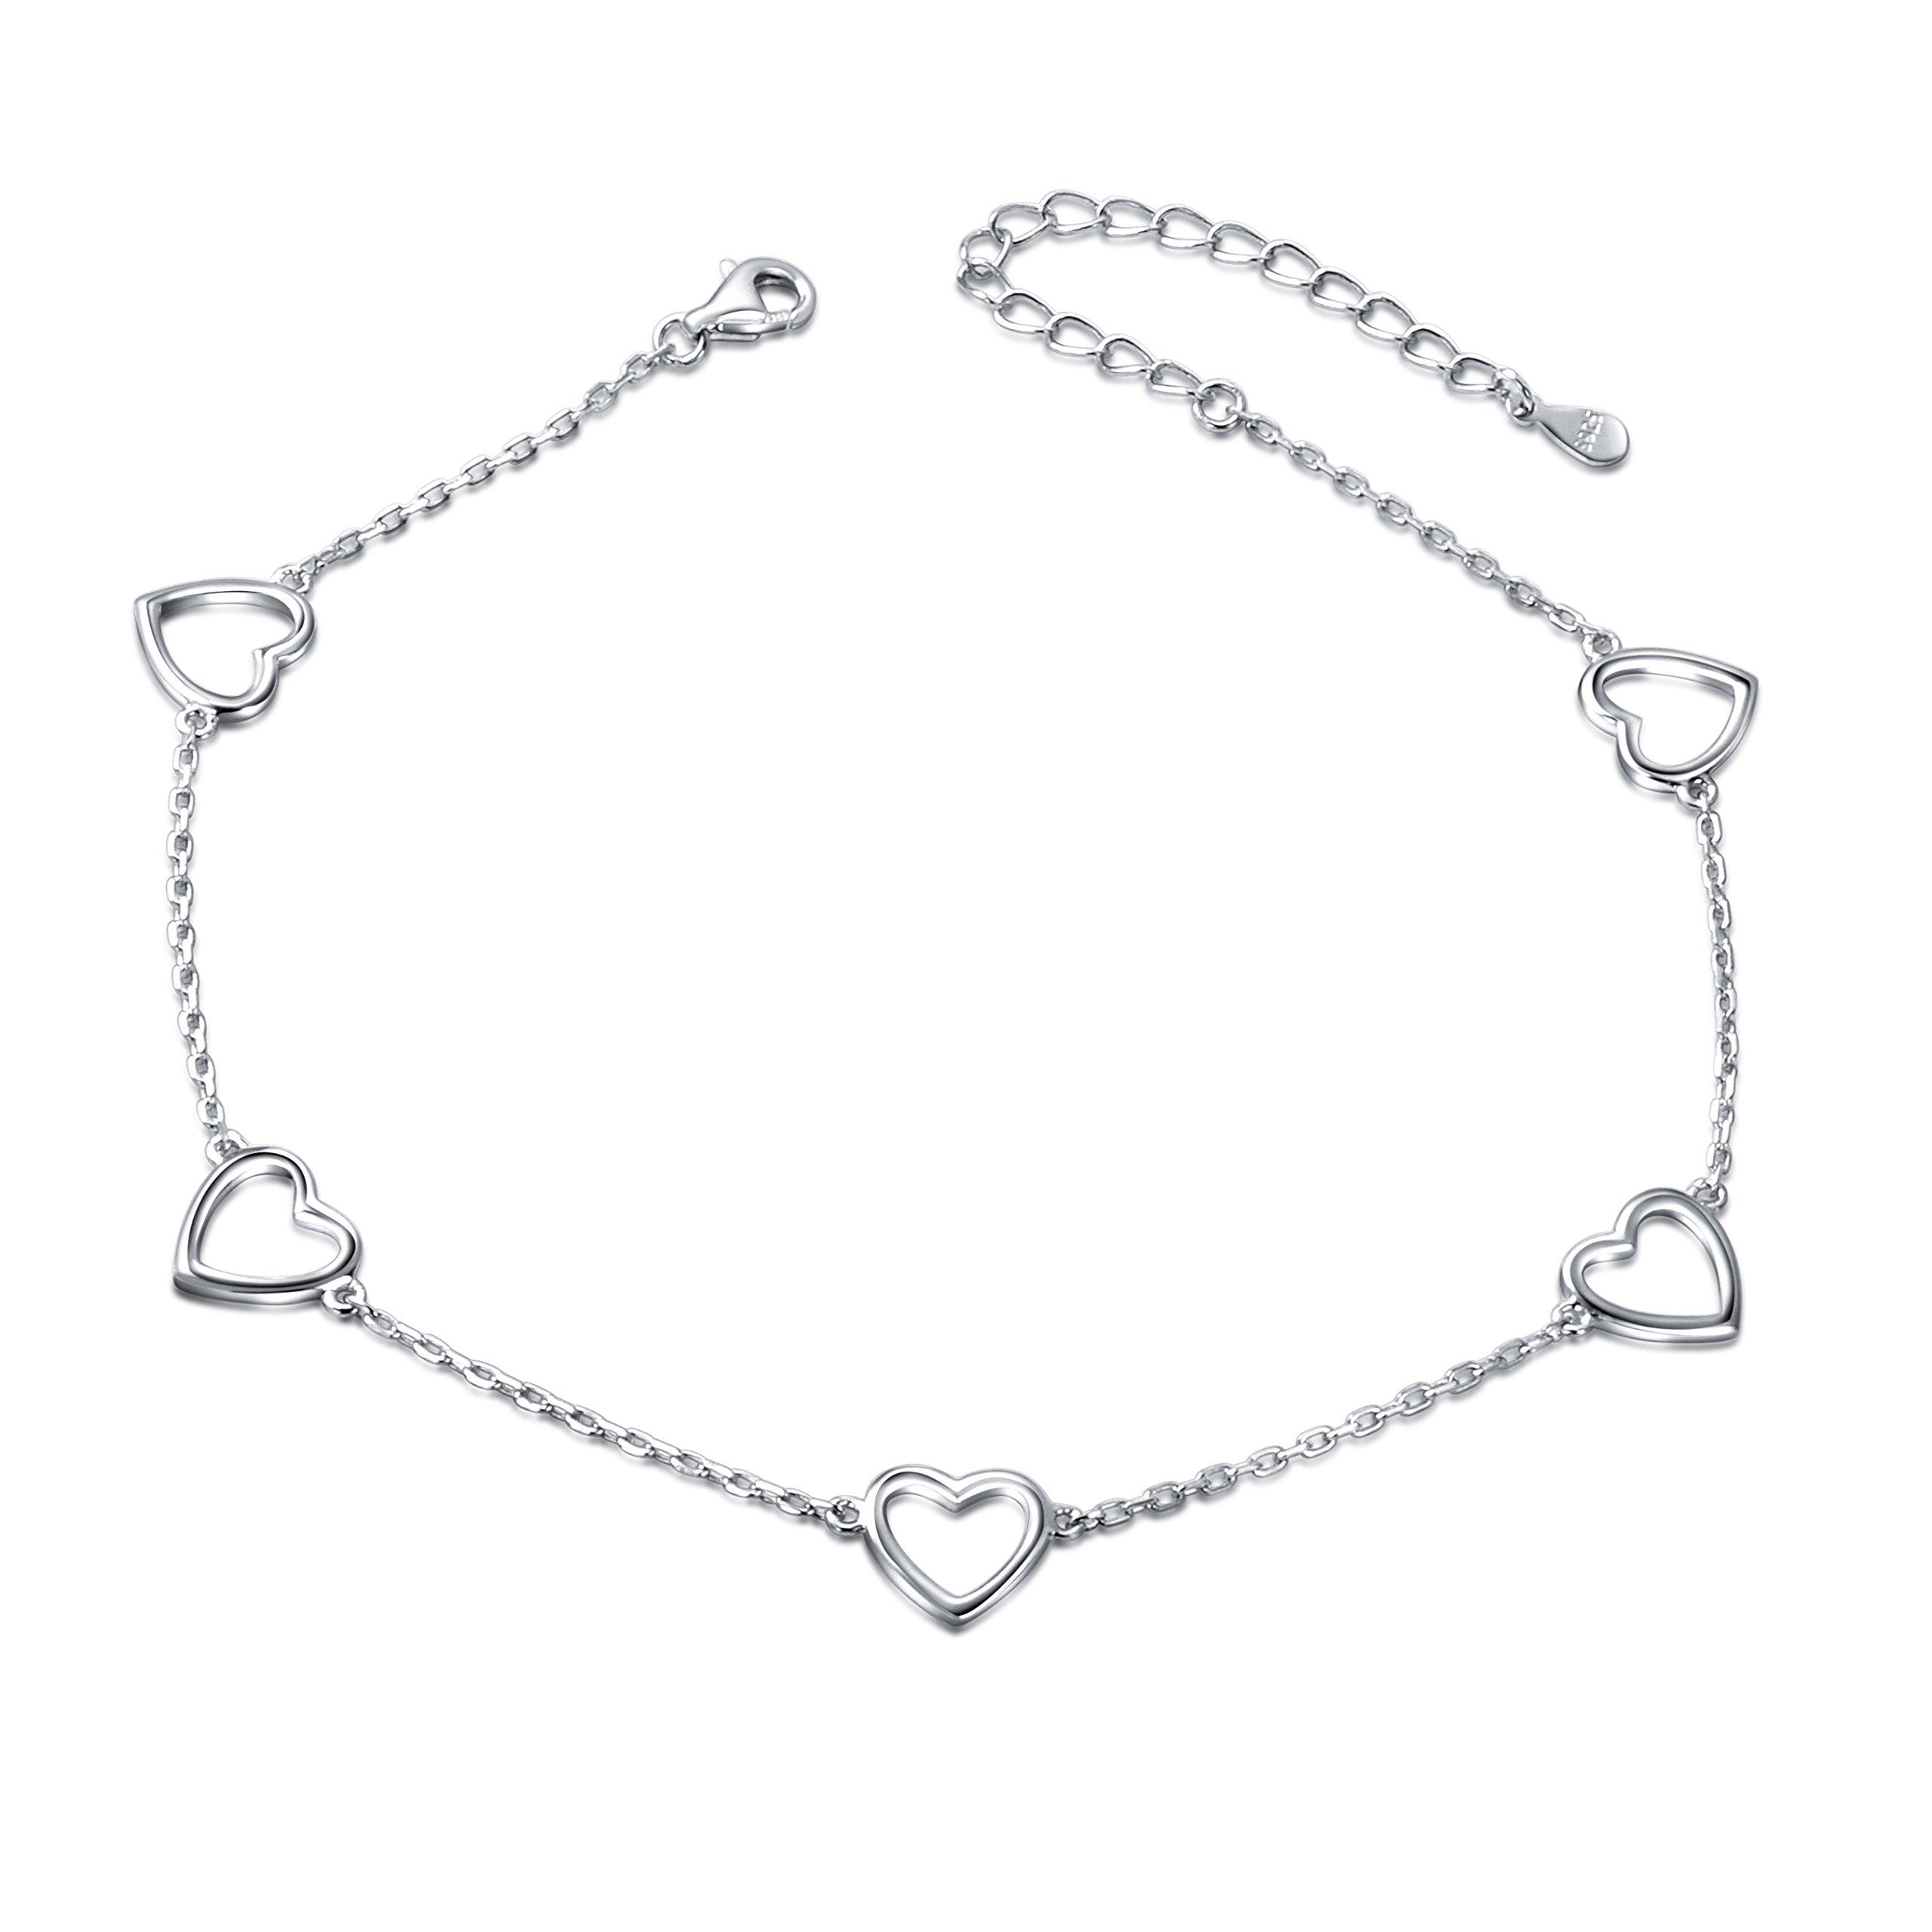 DAOCHONG heart Anklet for Women S925 Sterling Silver Adjustable Foot Ankle bracelet (Heart)